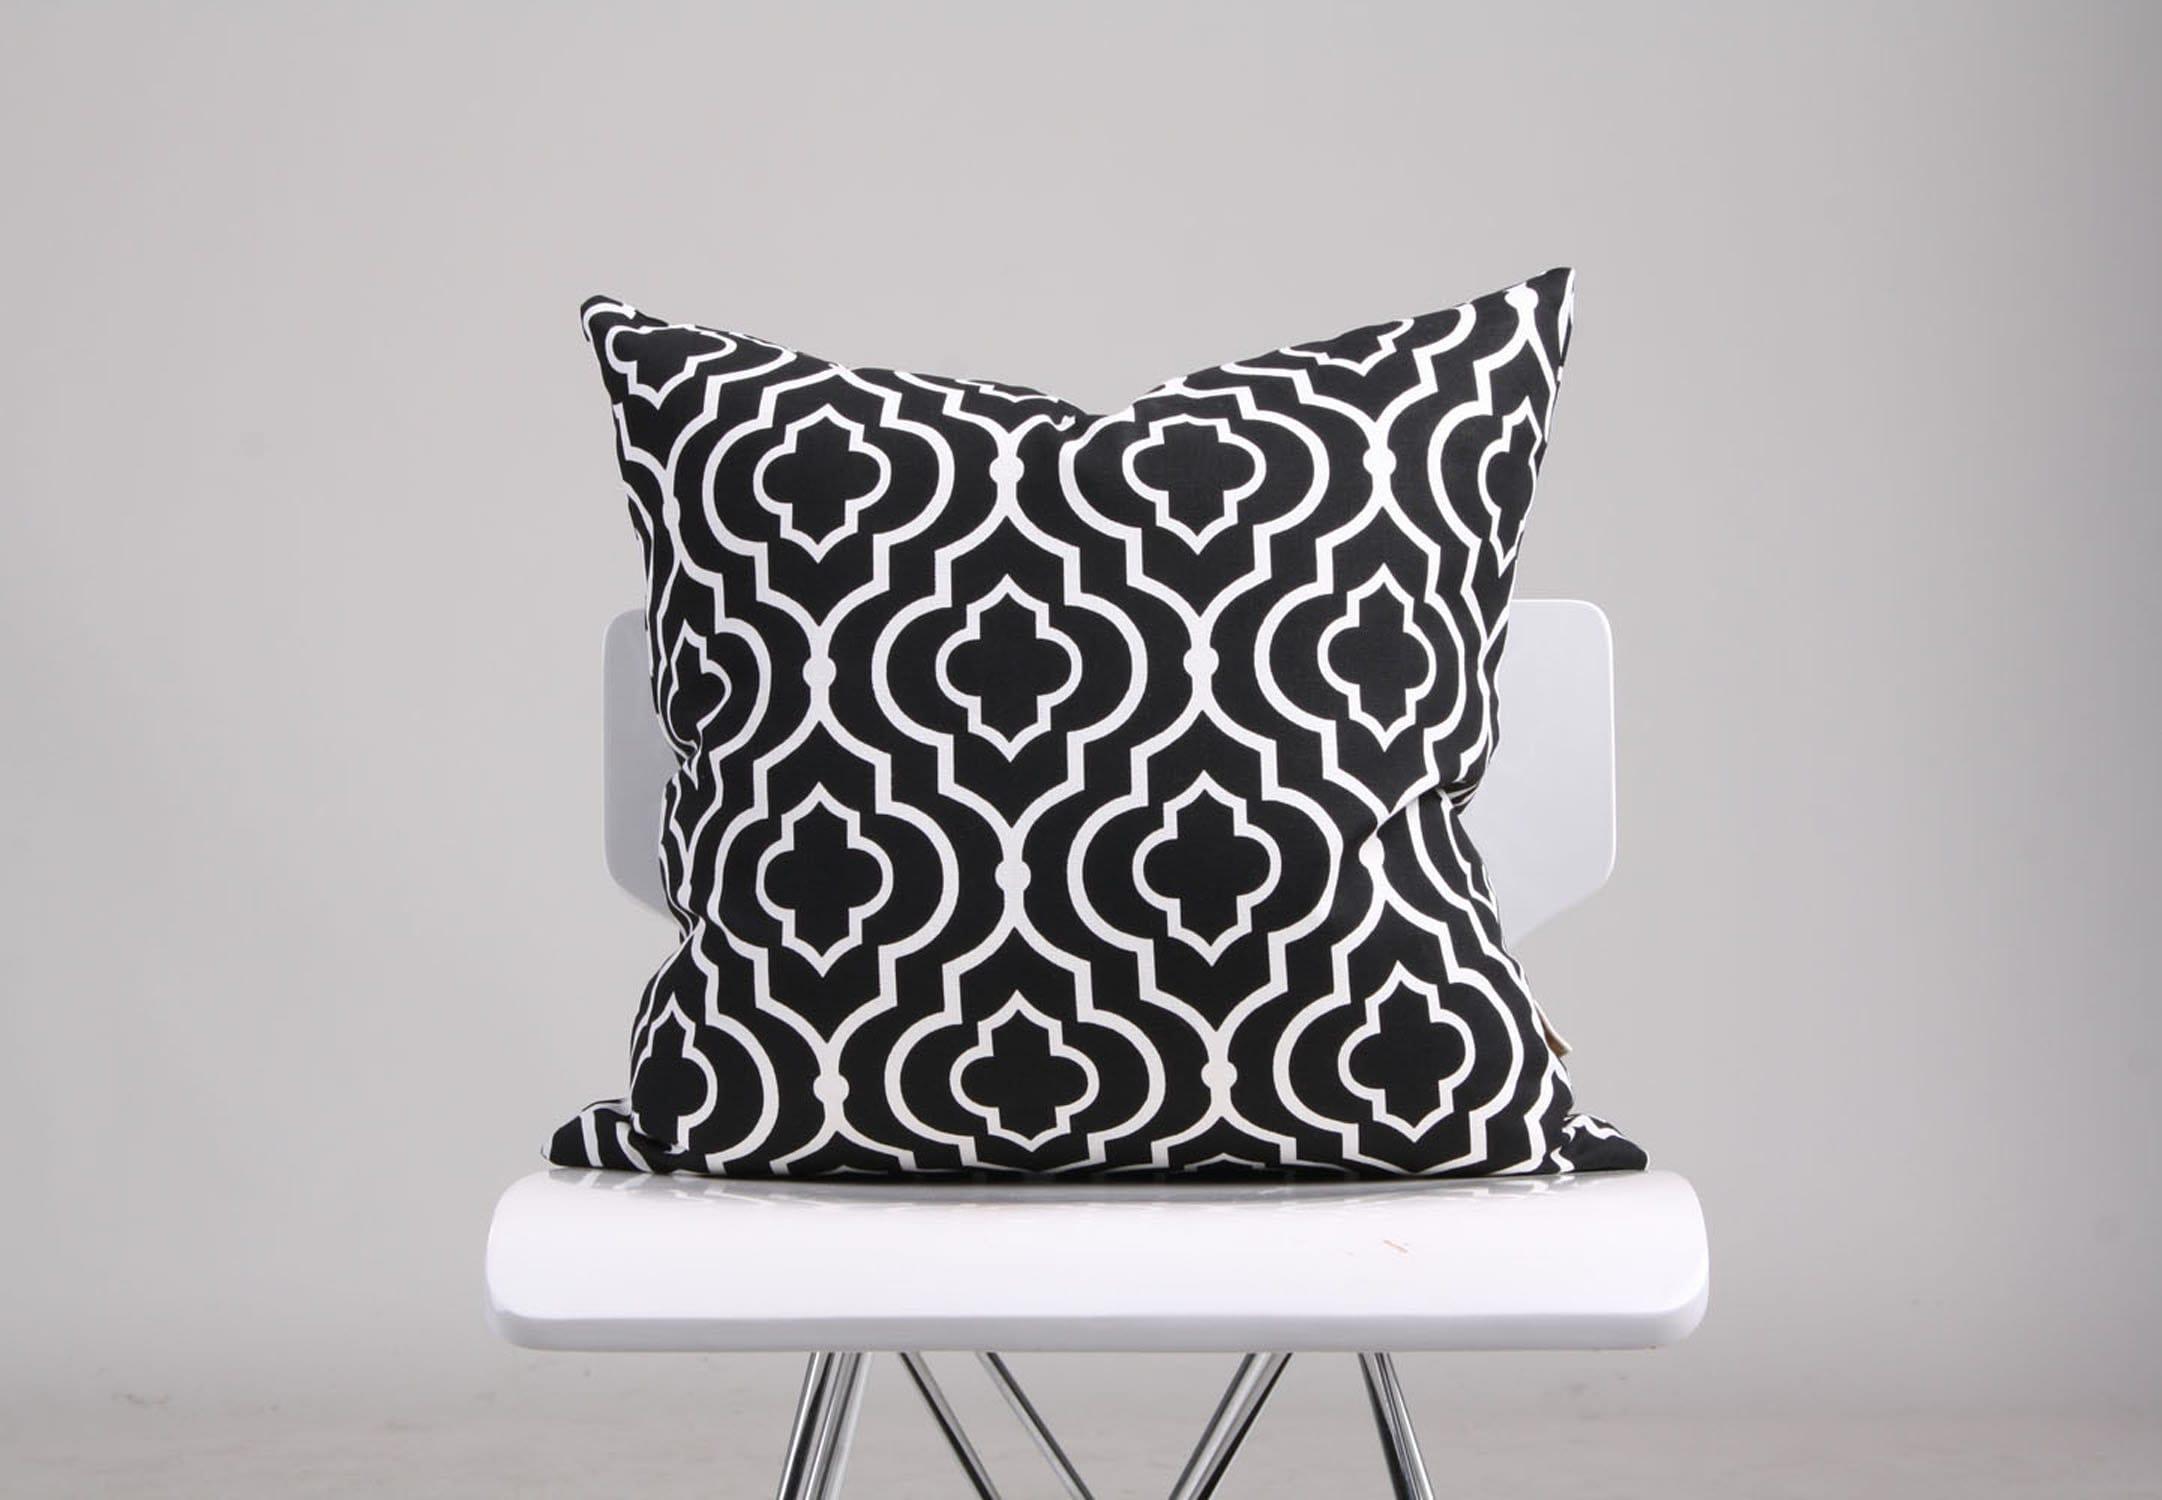 Moroccan Tile Pillow Cover Black White Pillow Geometric Cushion Black Cushion Decorative Pillow Black Accent Pillow Throw Pillow